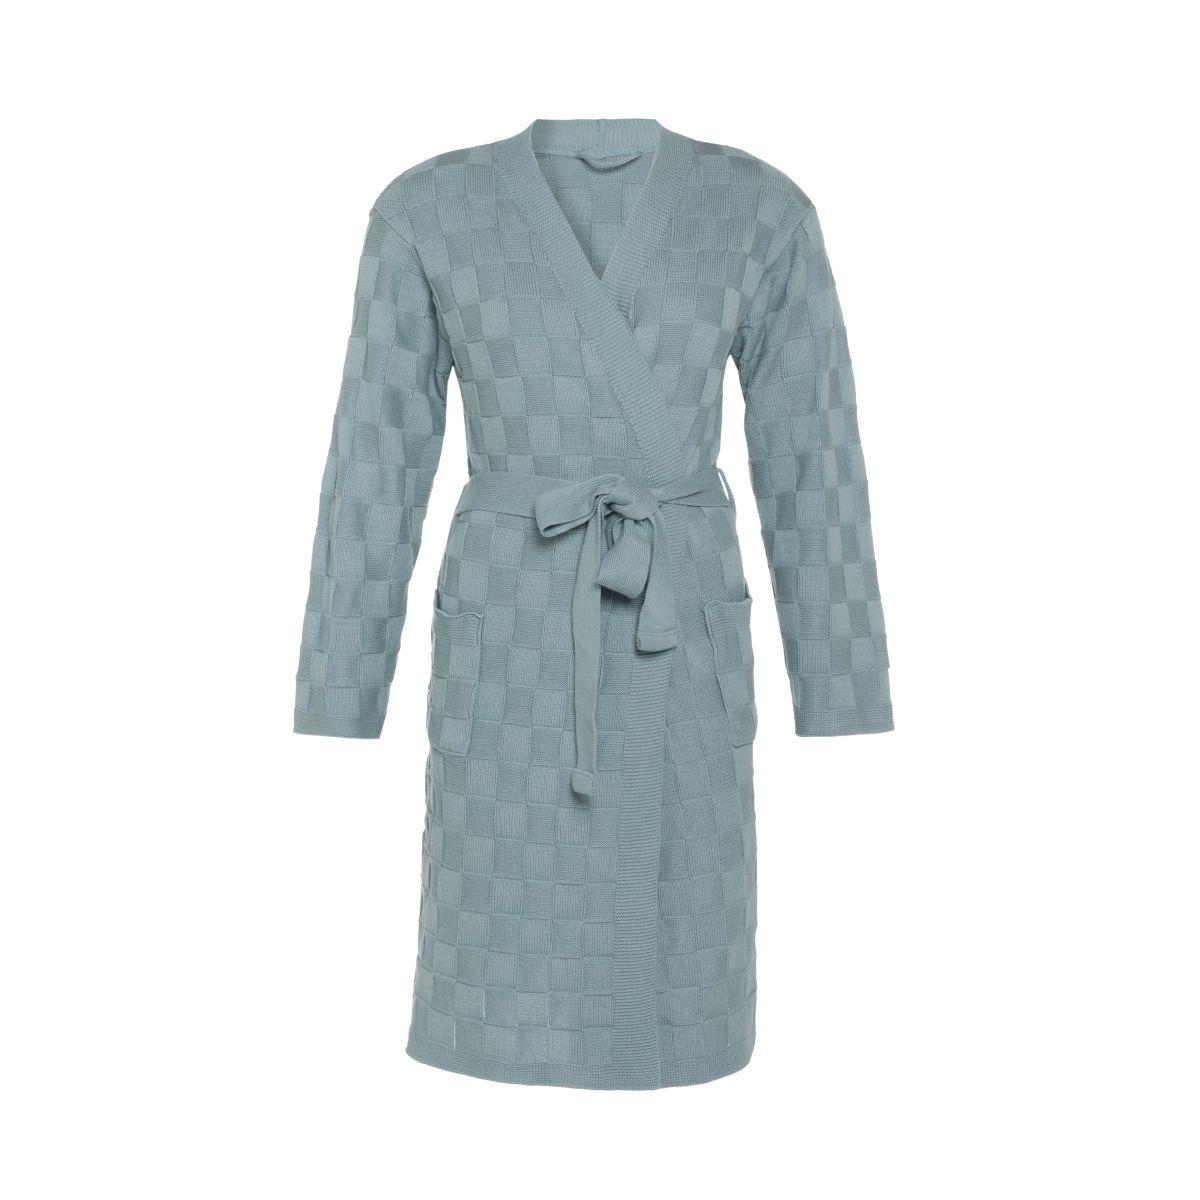 knit factory kf20222000951 badjas ivy stone green lxl 1